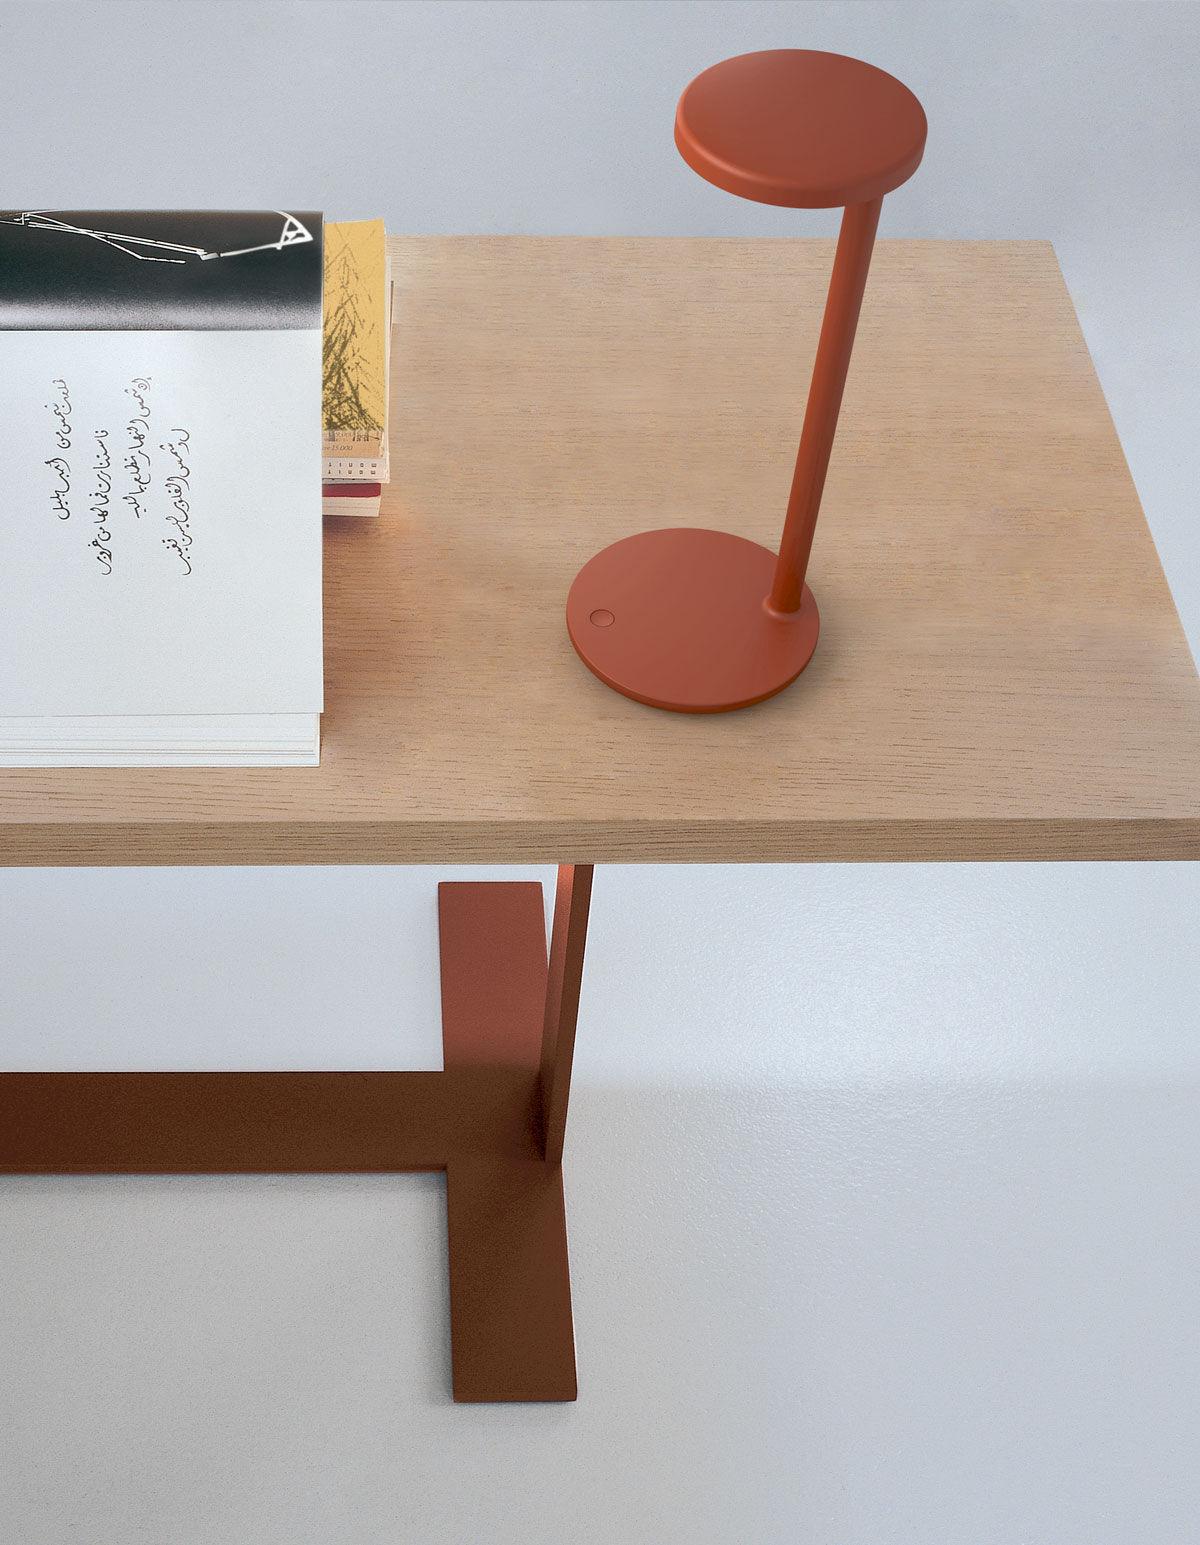 stories-Oblique-Vincent-Van-Duysen-flos-15